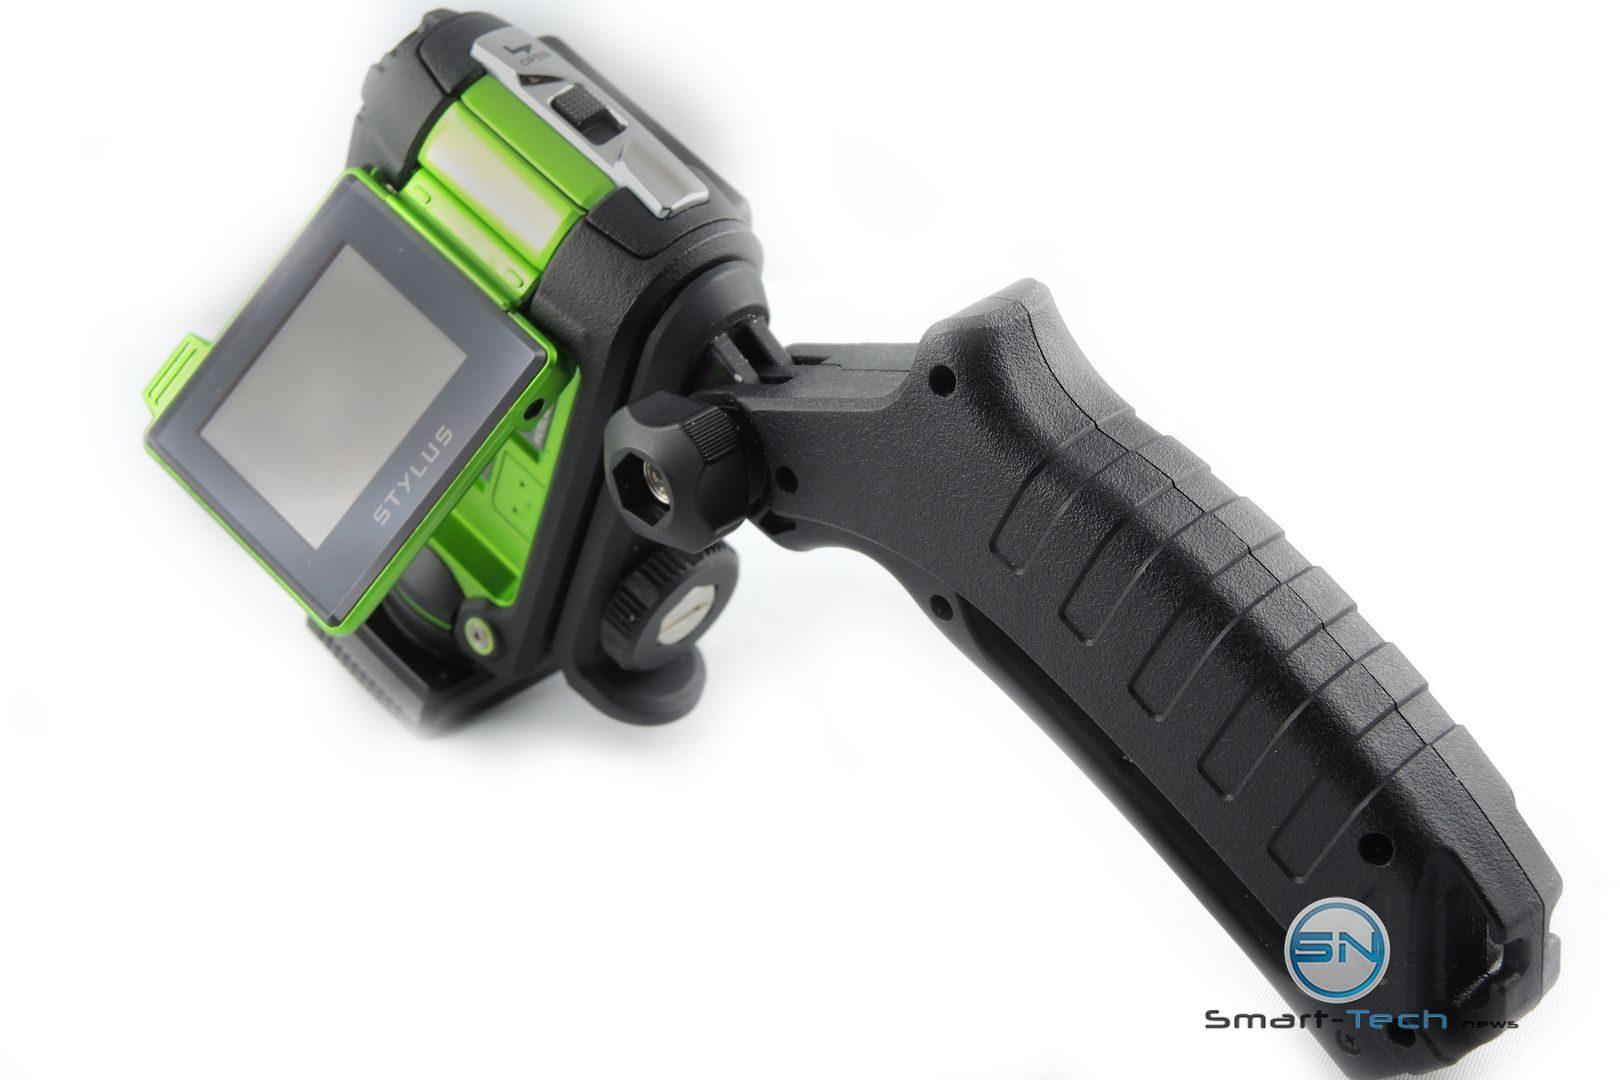 Haltegriff - Olympus TG Tracker - SmartCamNews